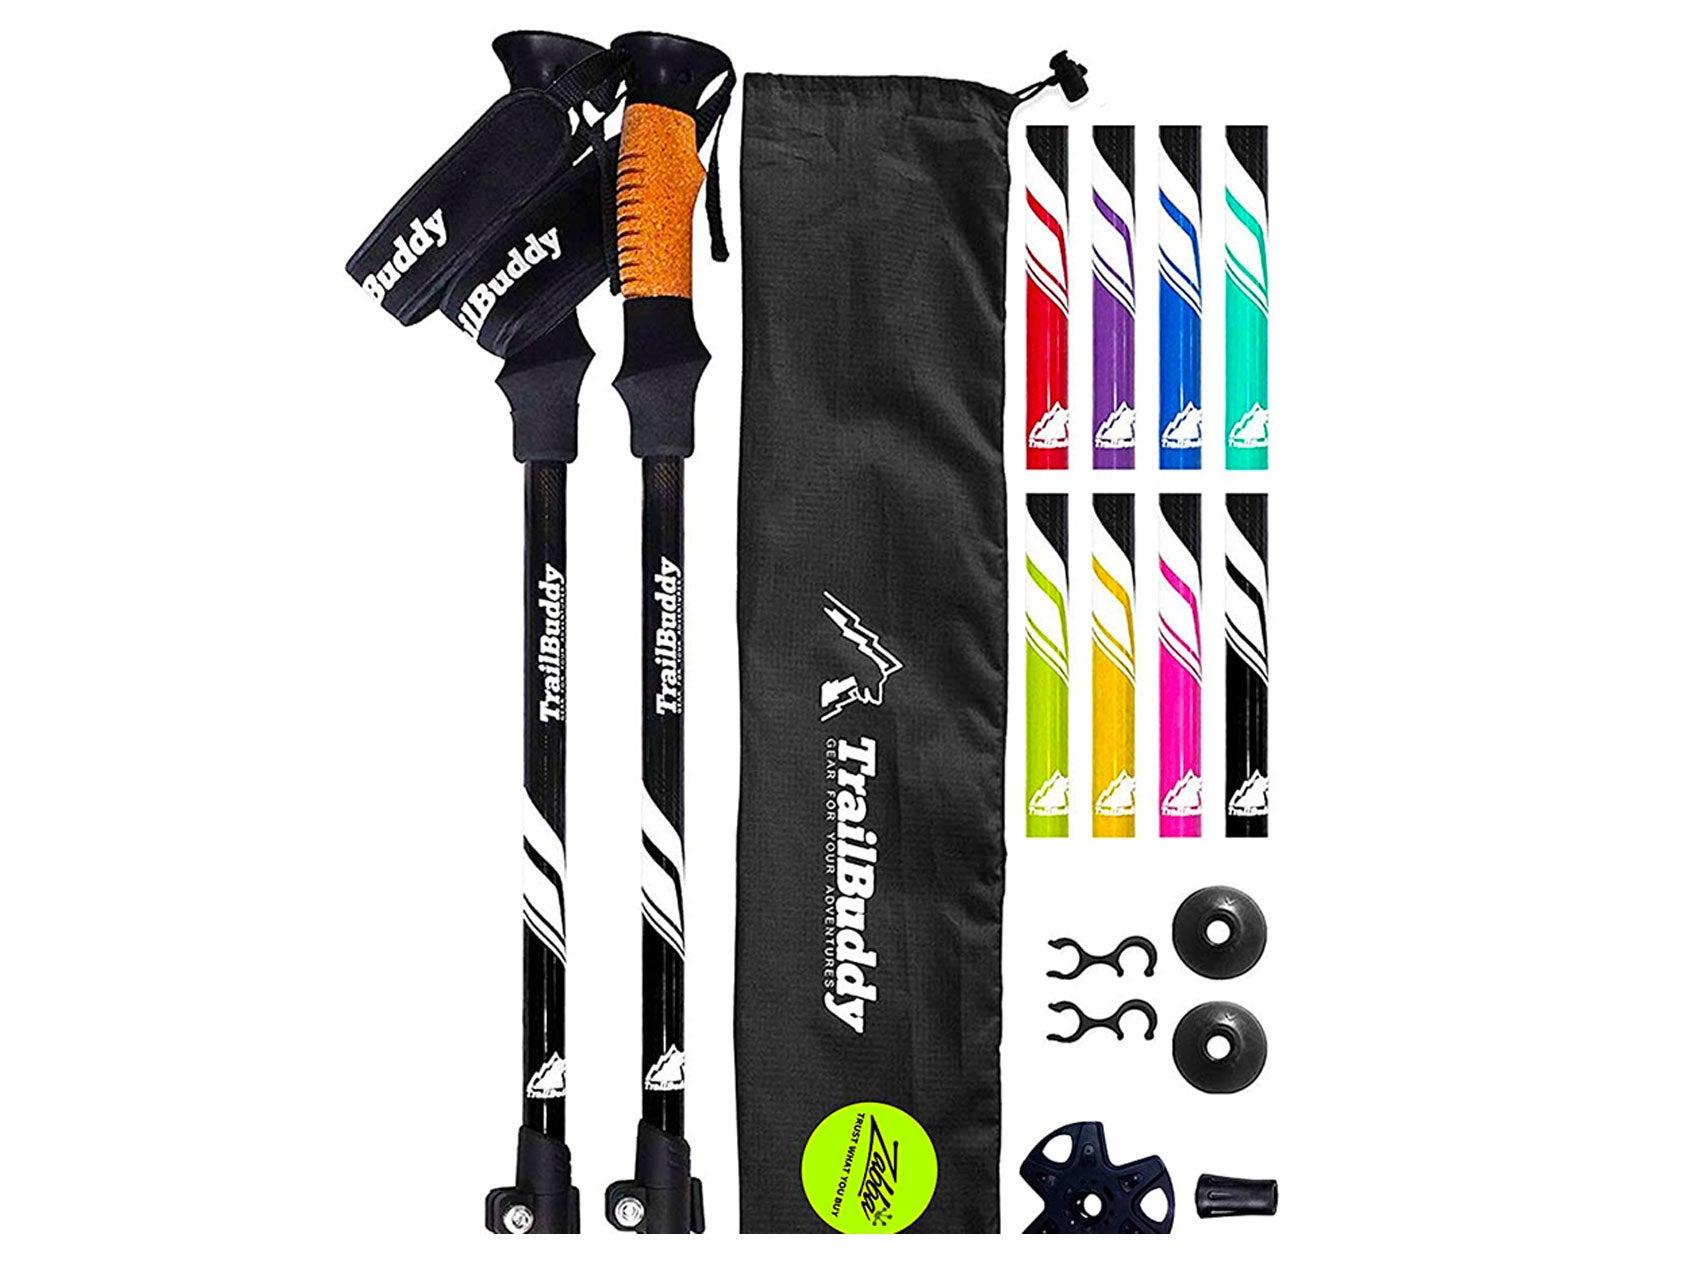 TrailBuddy Trekking Poles - 2-pc Pack Adjustable Hiking or Walking Sticks